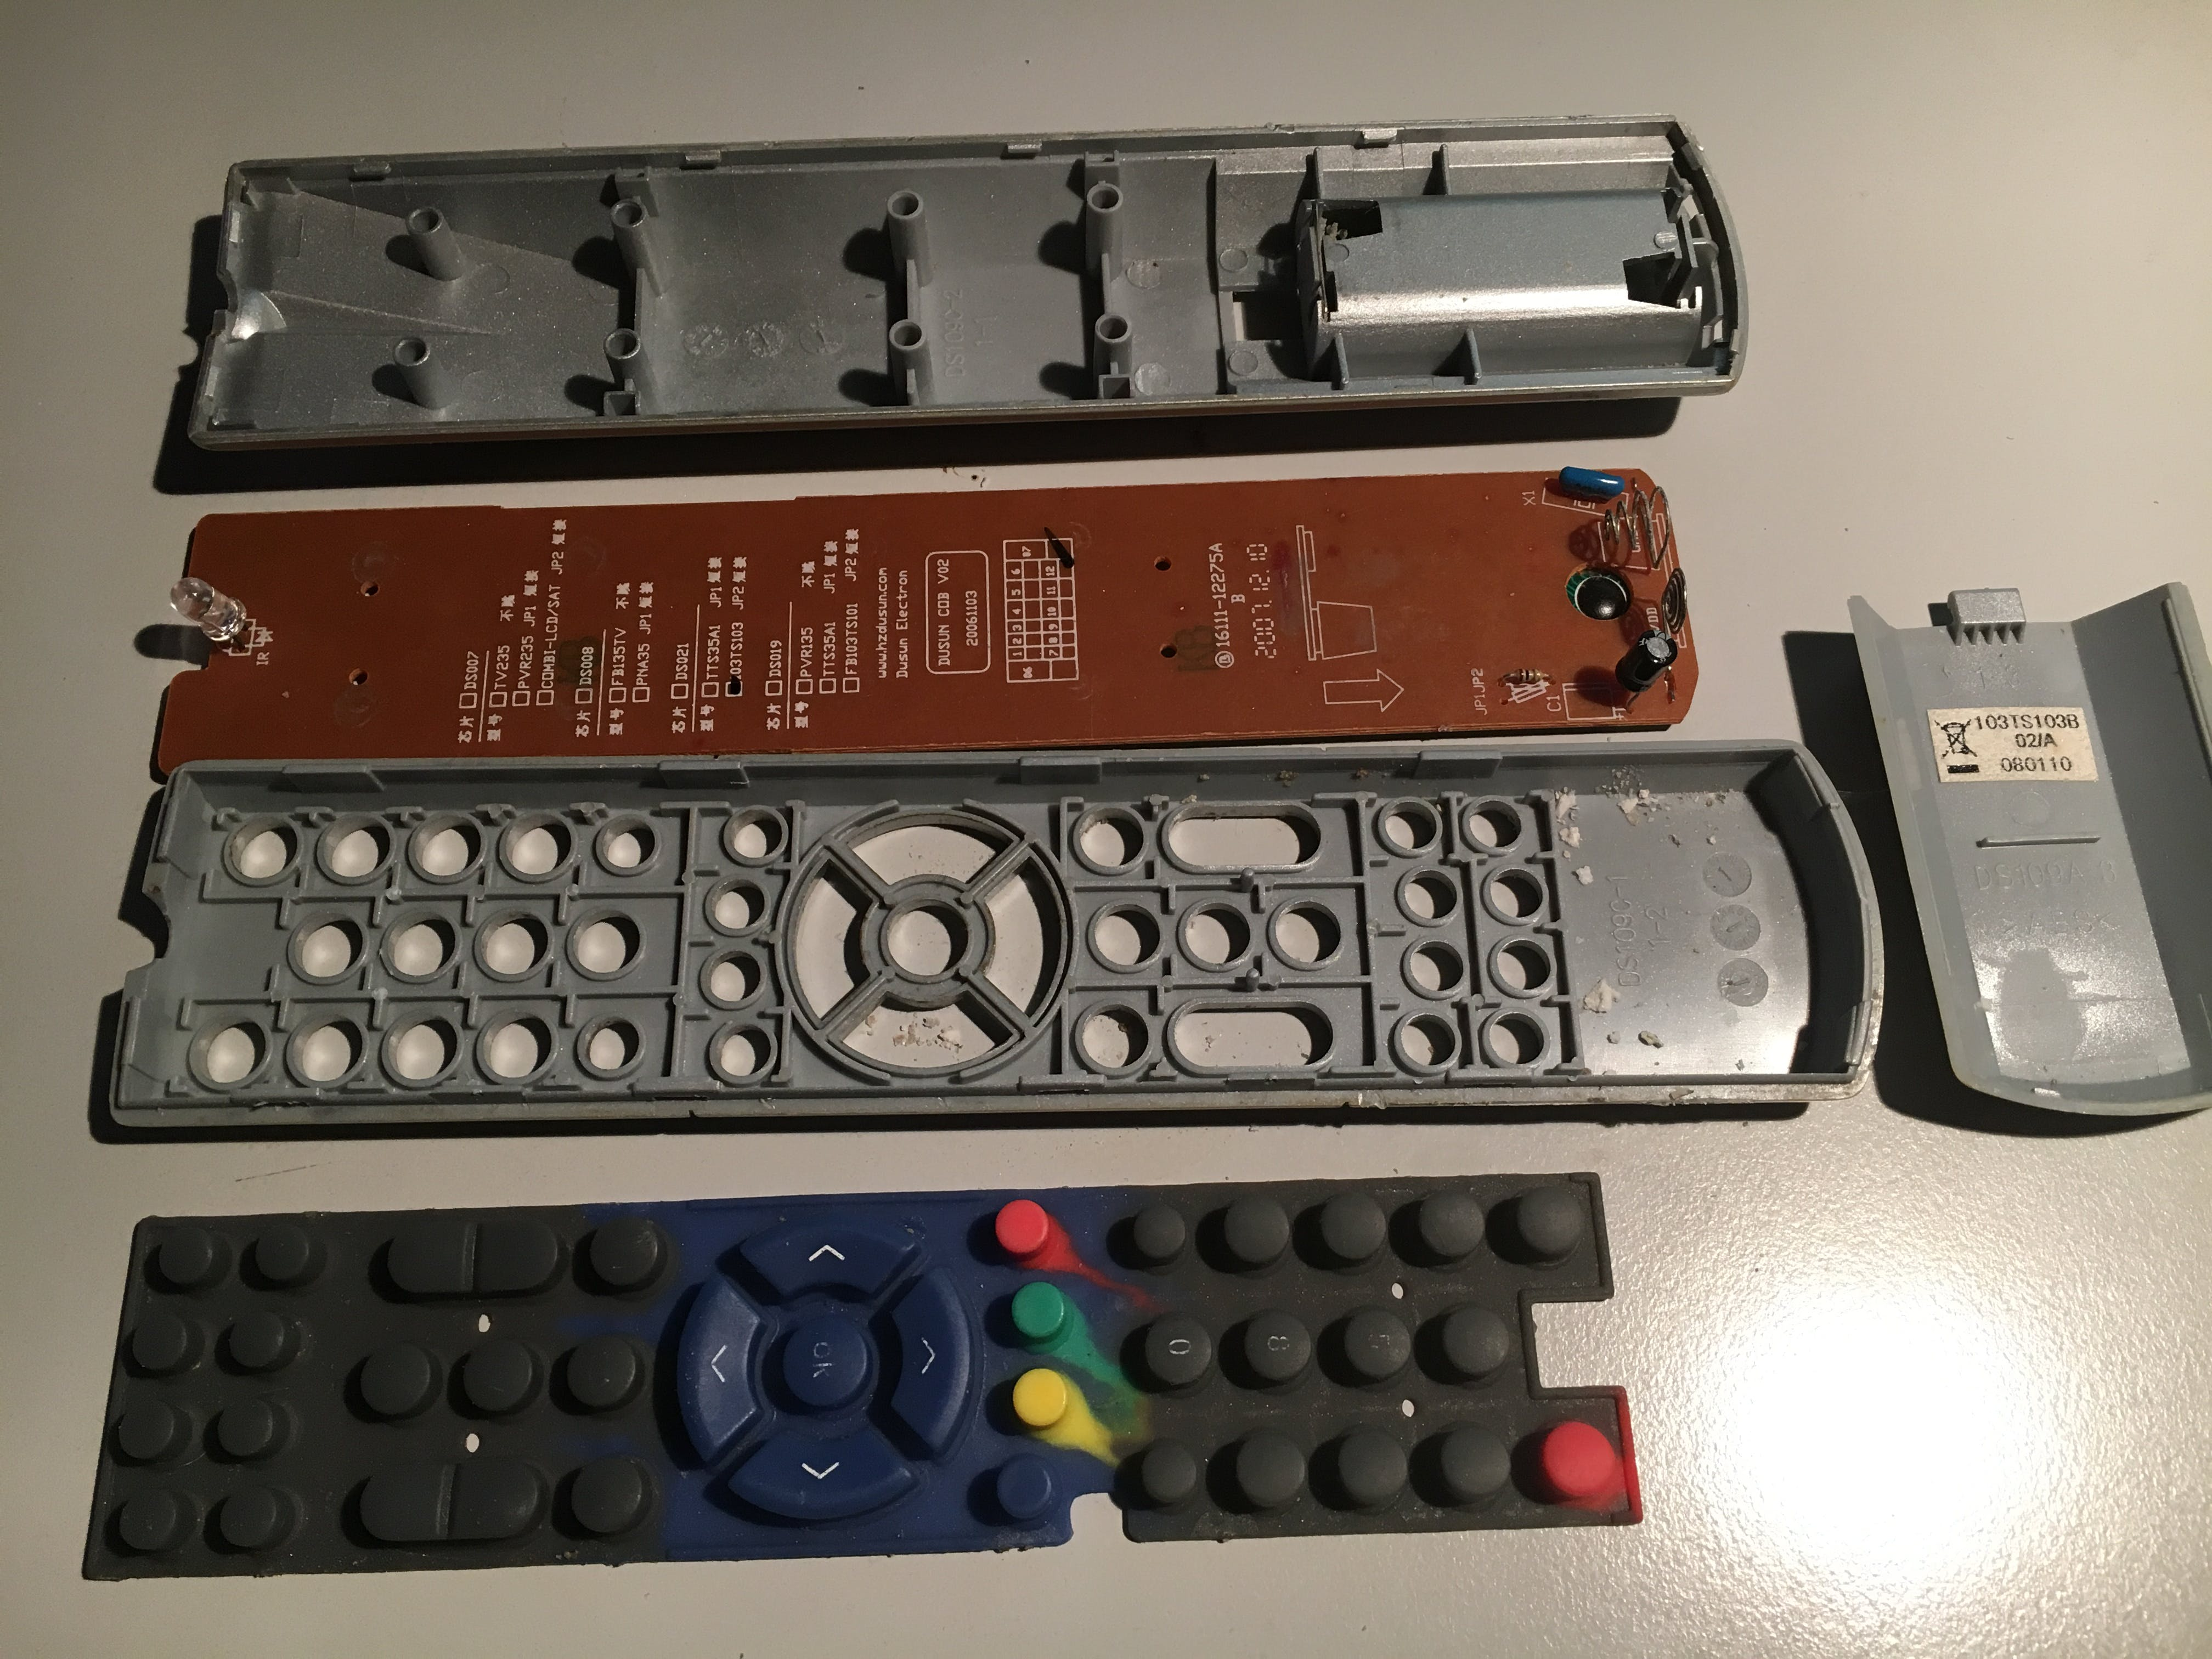 TechniSat Remote Control